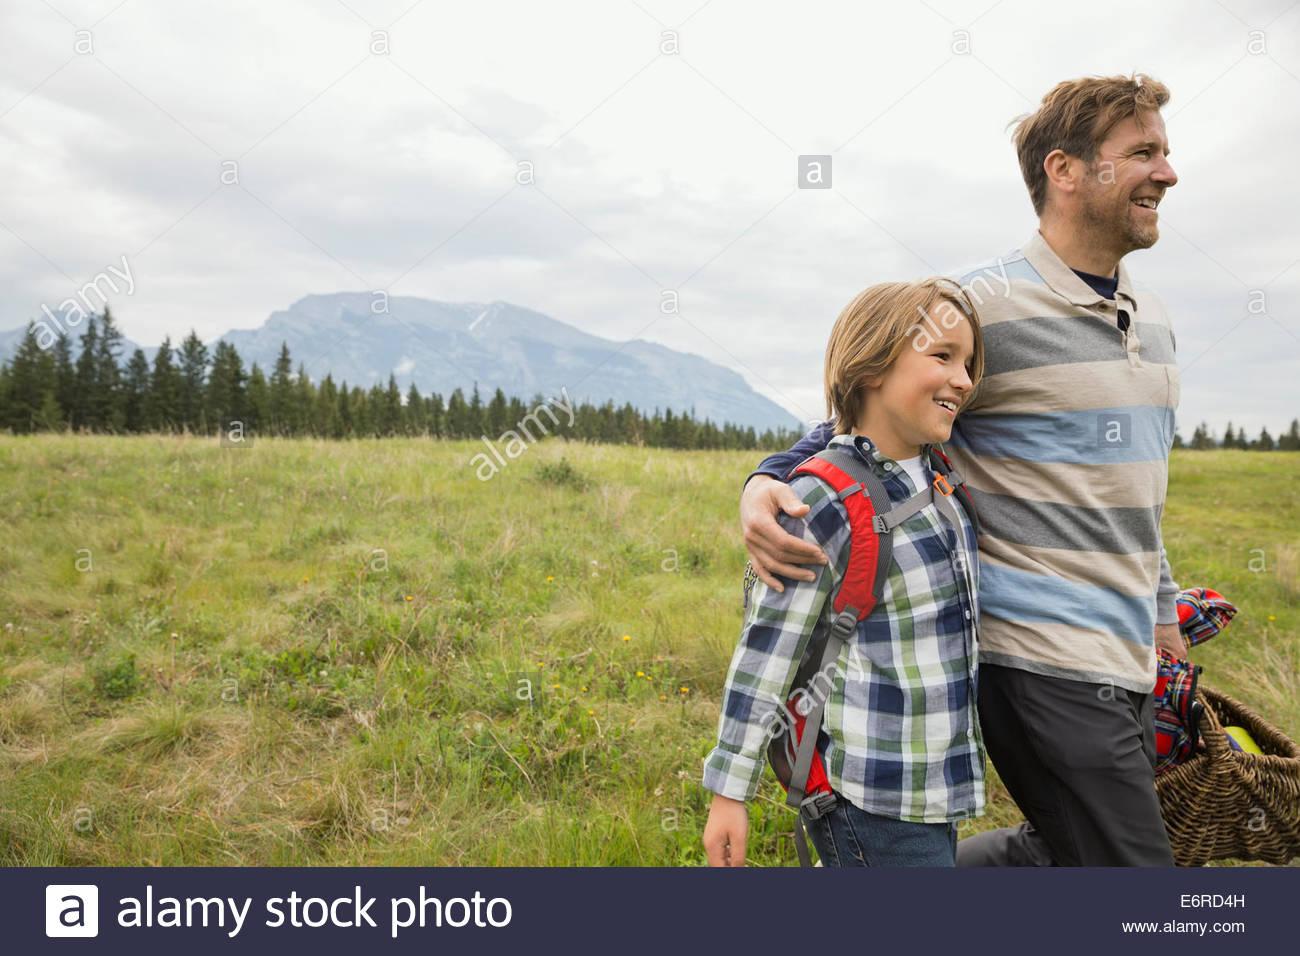 Père et fils having picnic in rural field Photo Stock